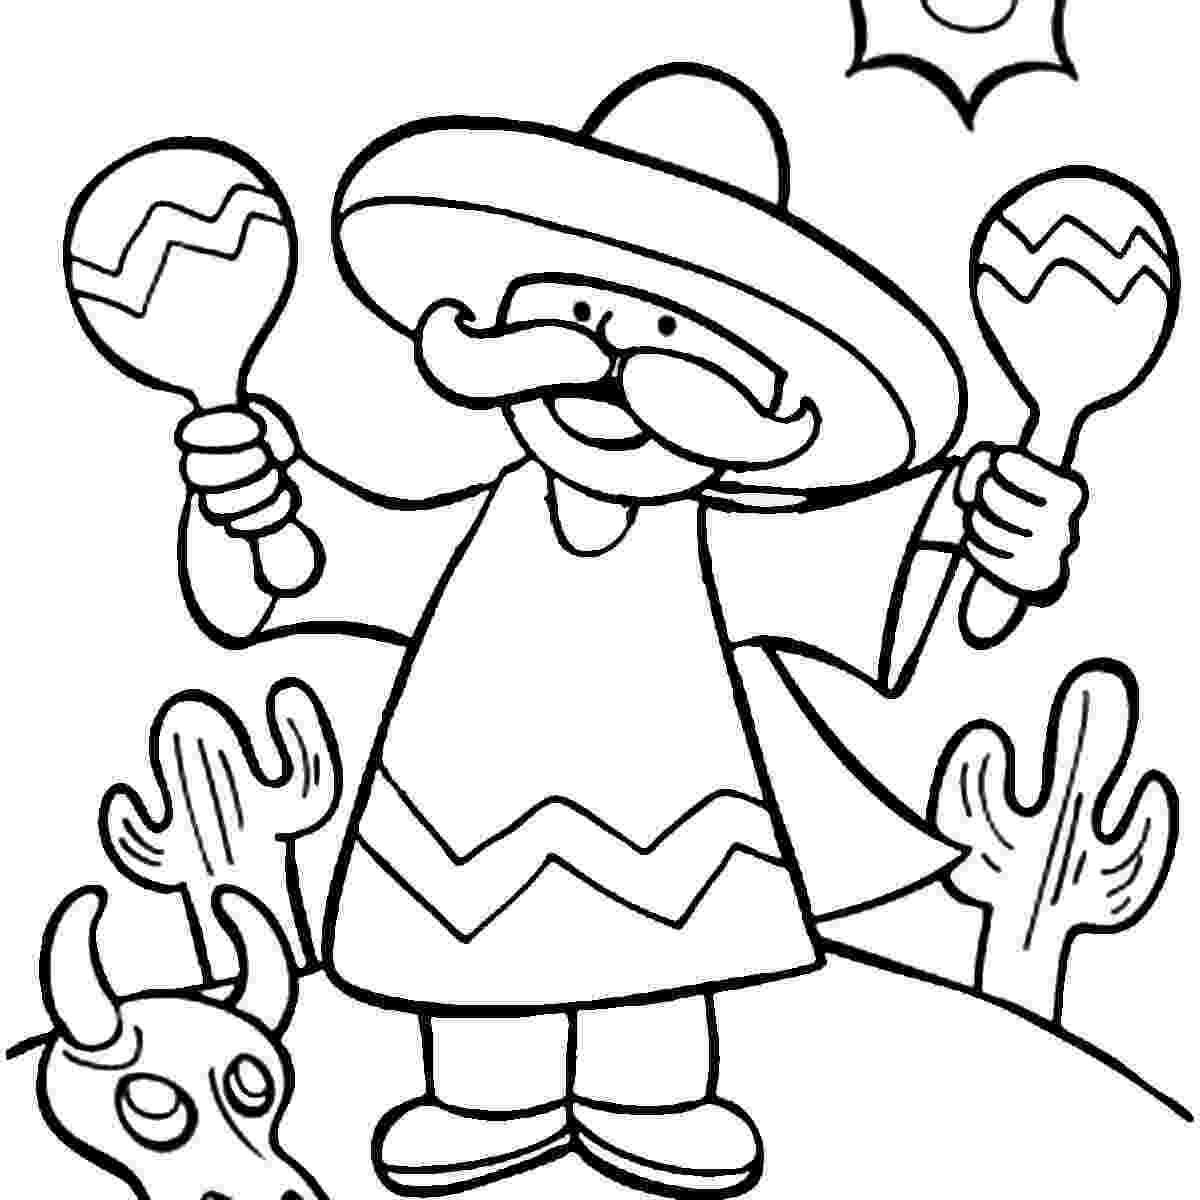 coloring pages for cinco de mayo 35 free printable cinco de mayo coloring pages for cinco pages coloring mayo de